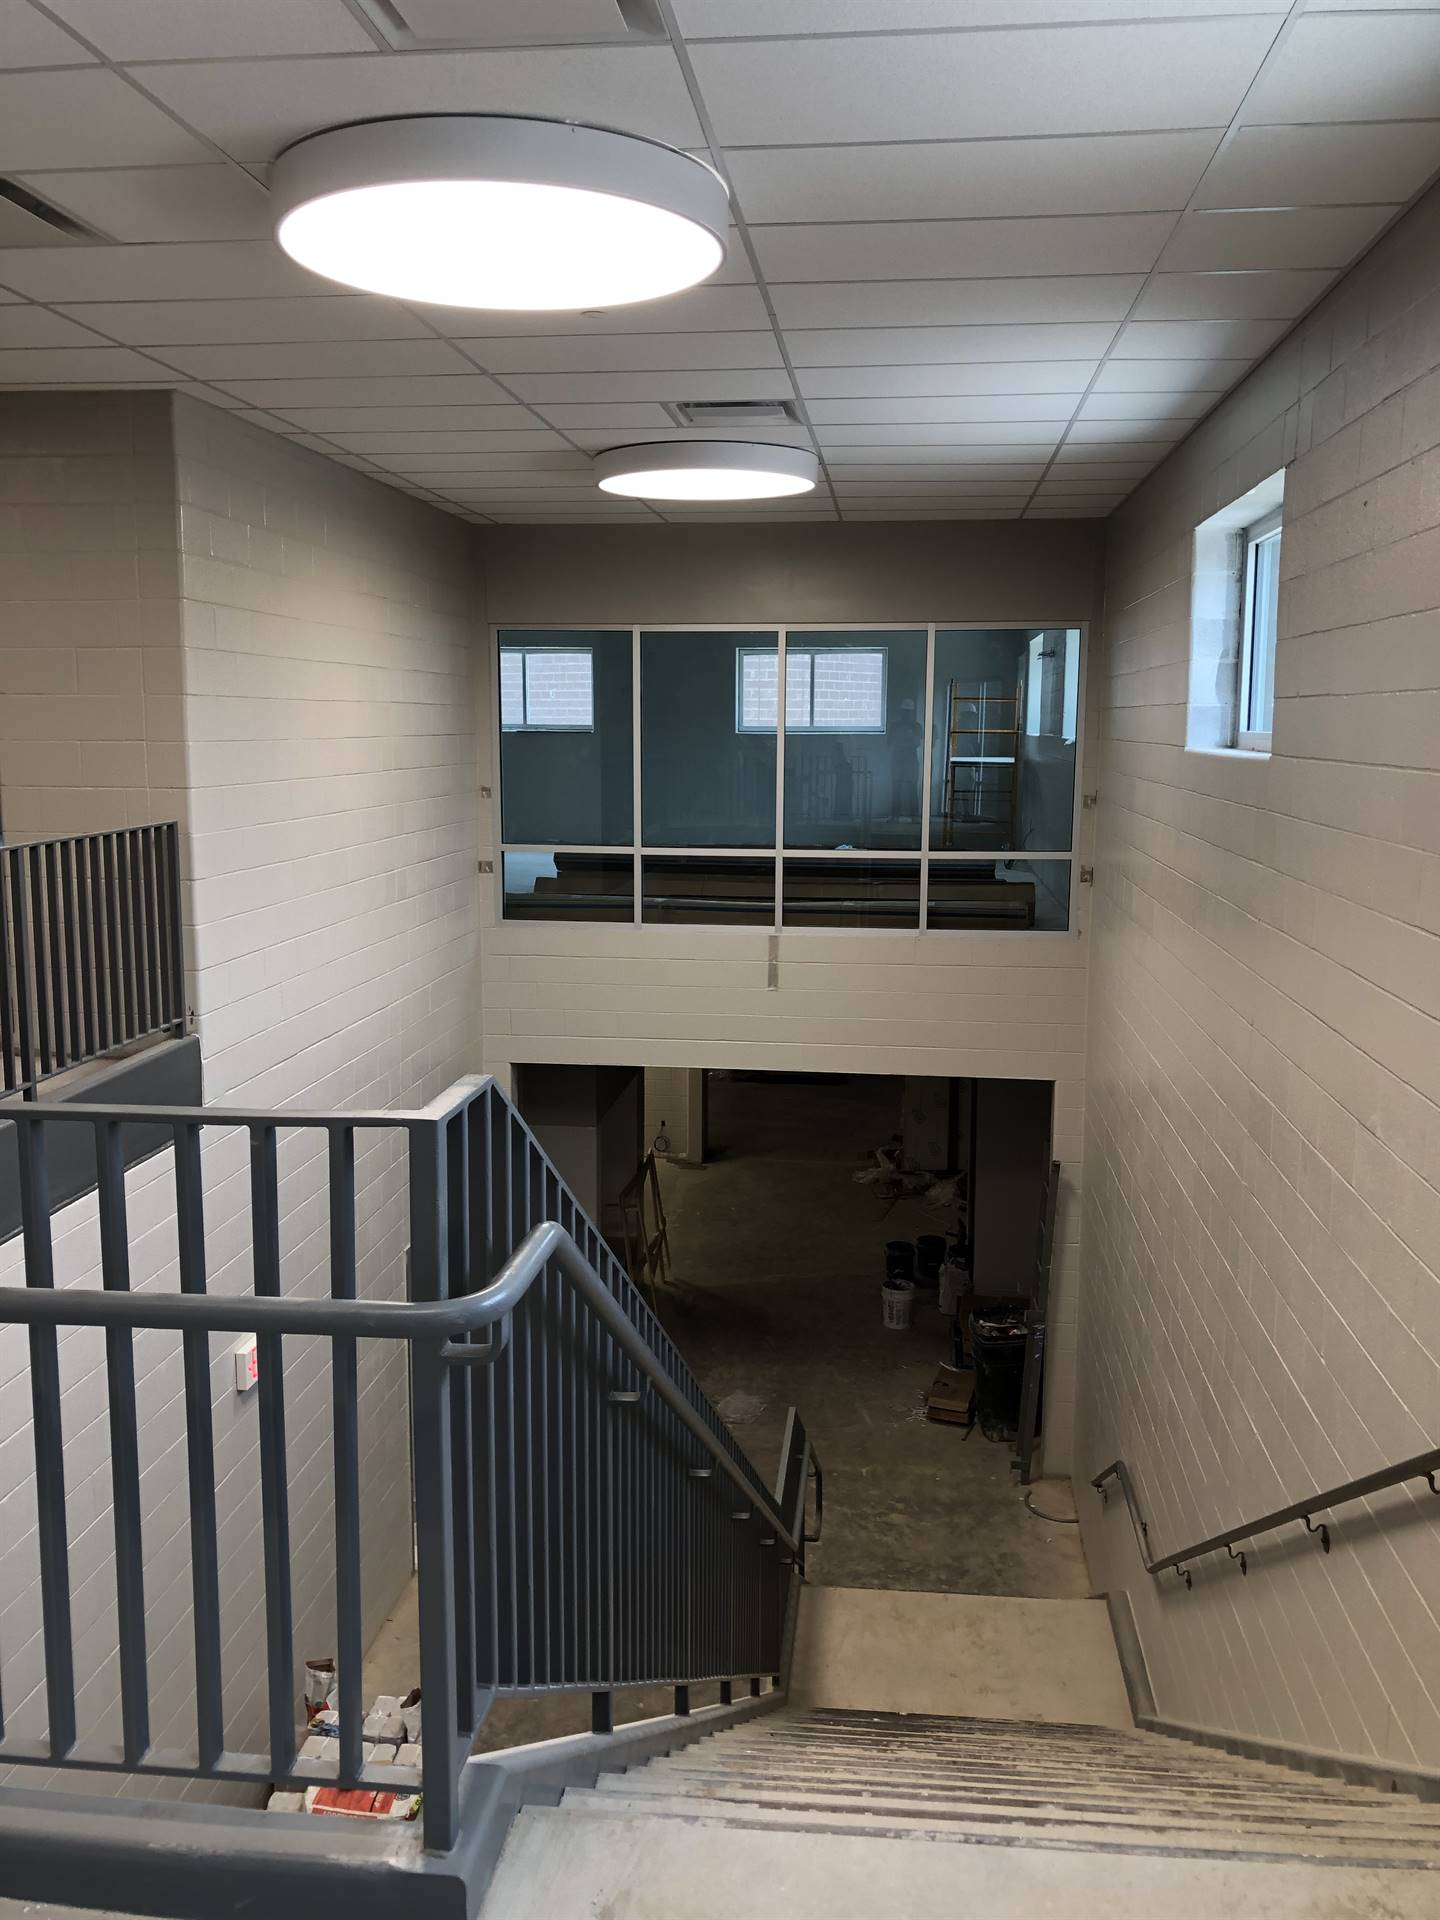 Parkside Elementary July 2019